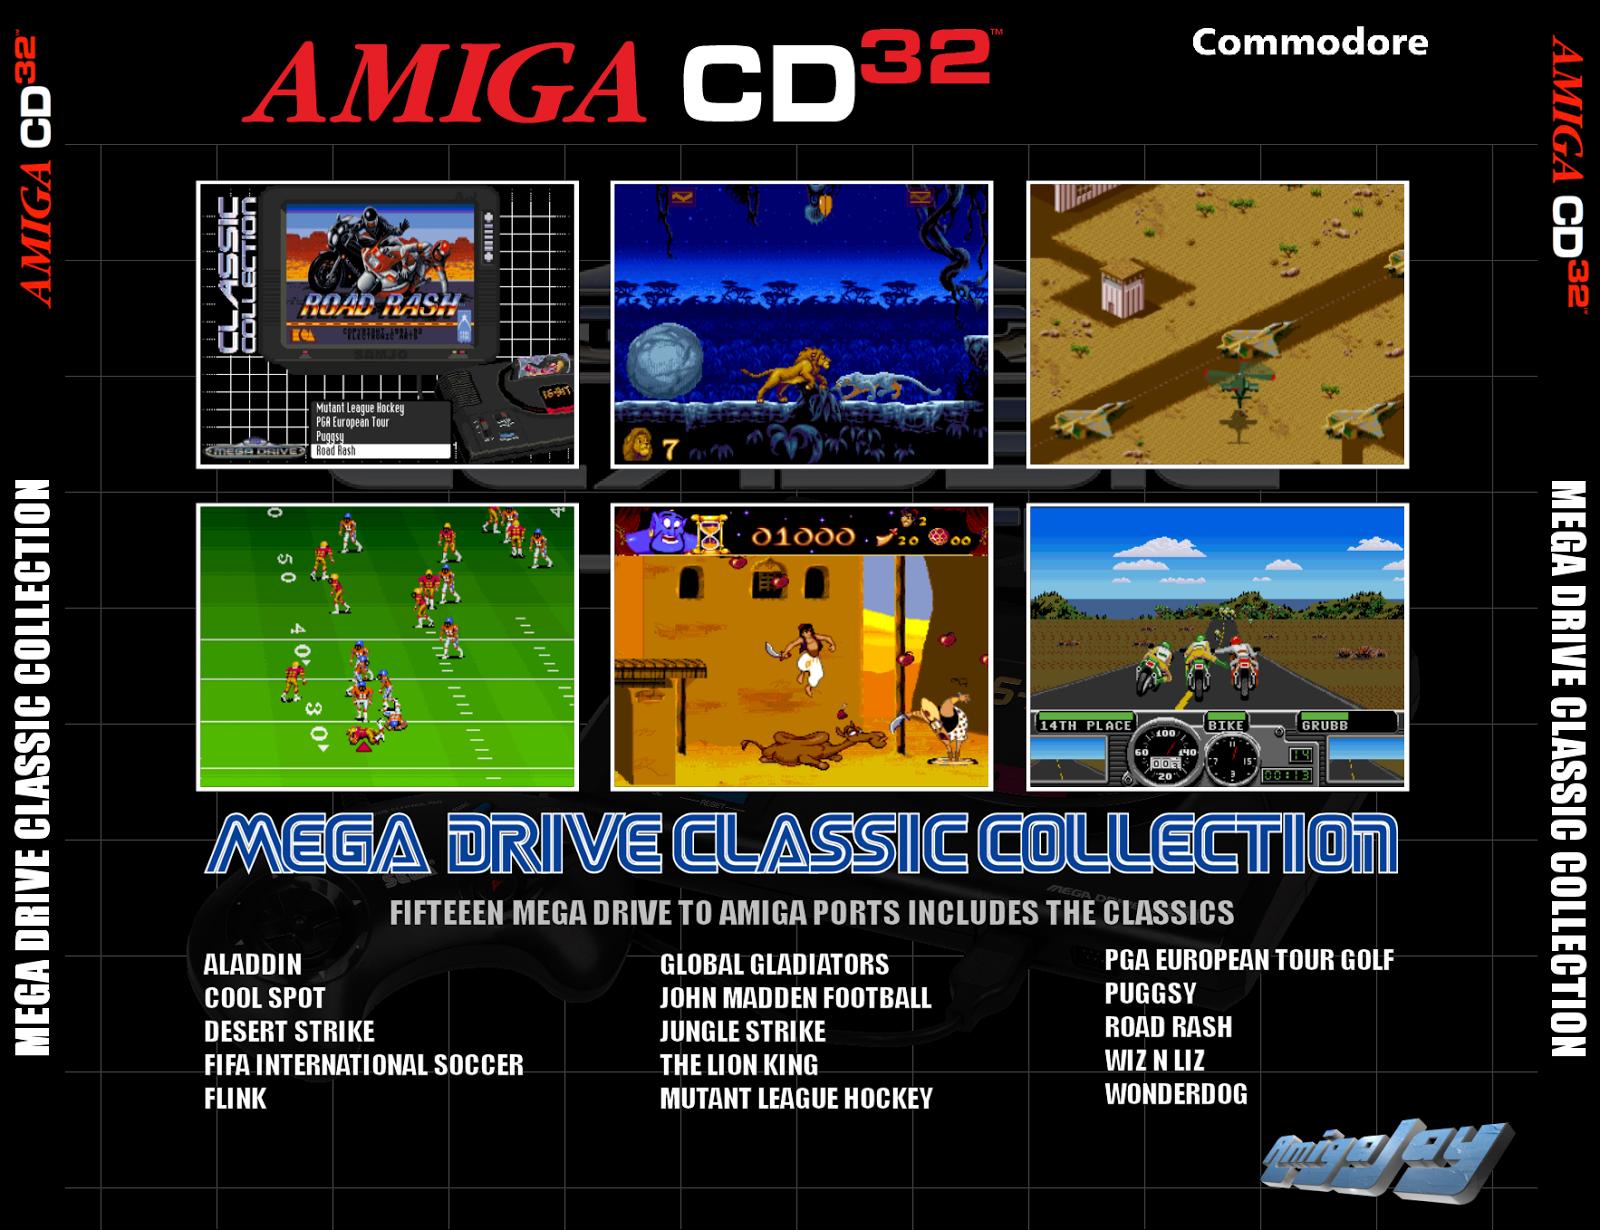 Download top amiga cd32 games free backupyoo.